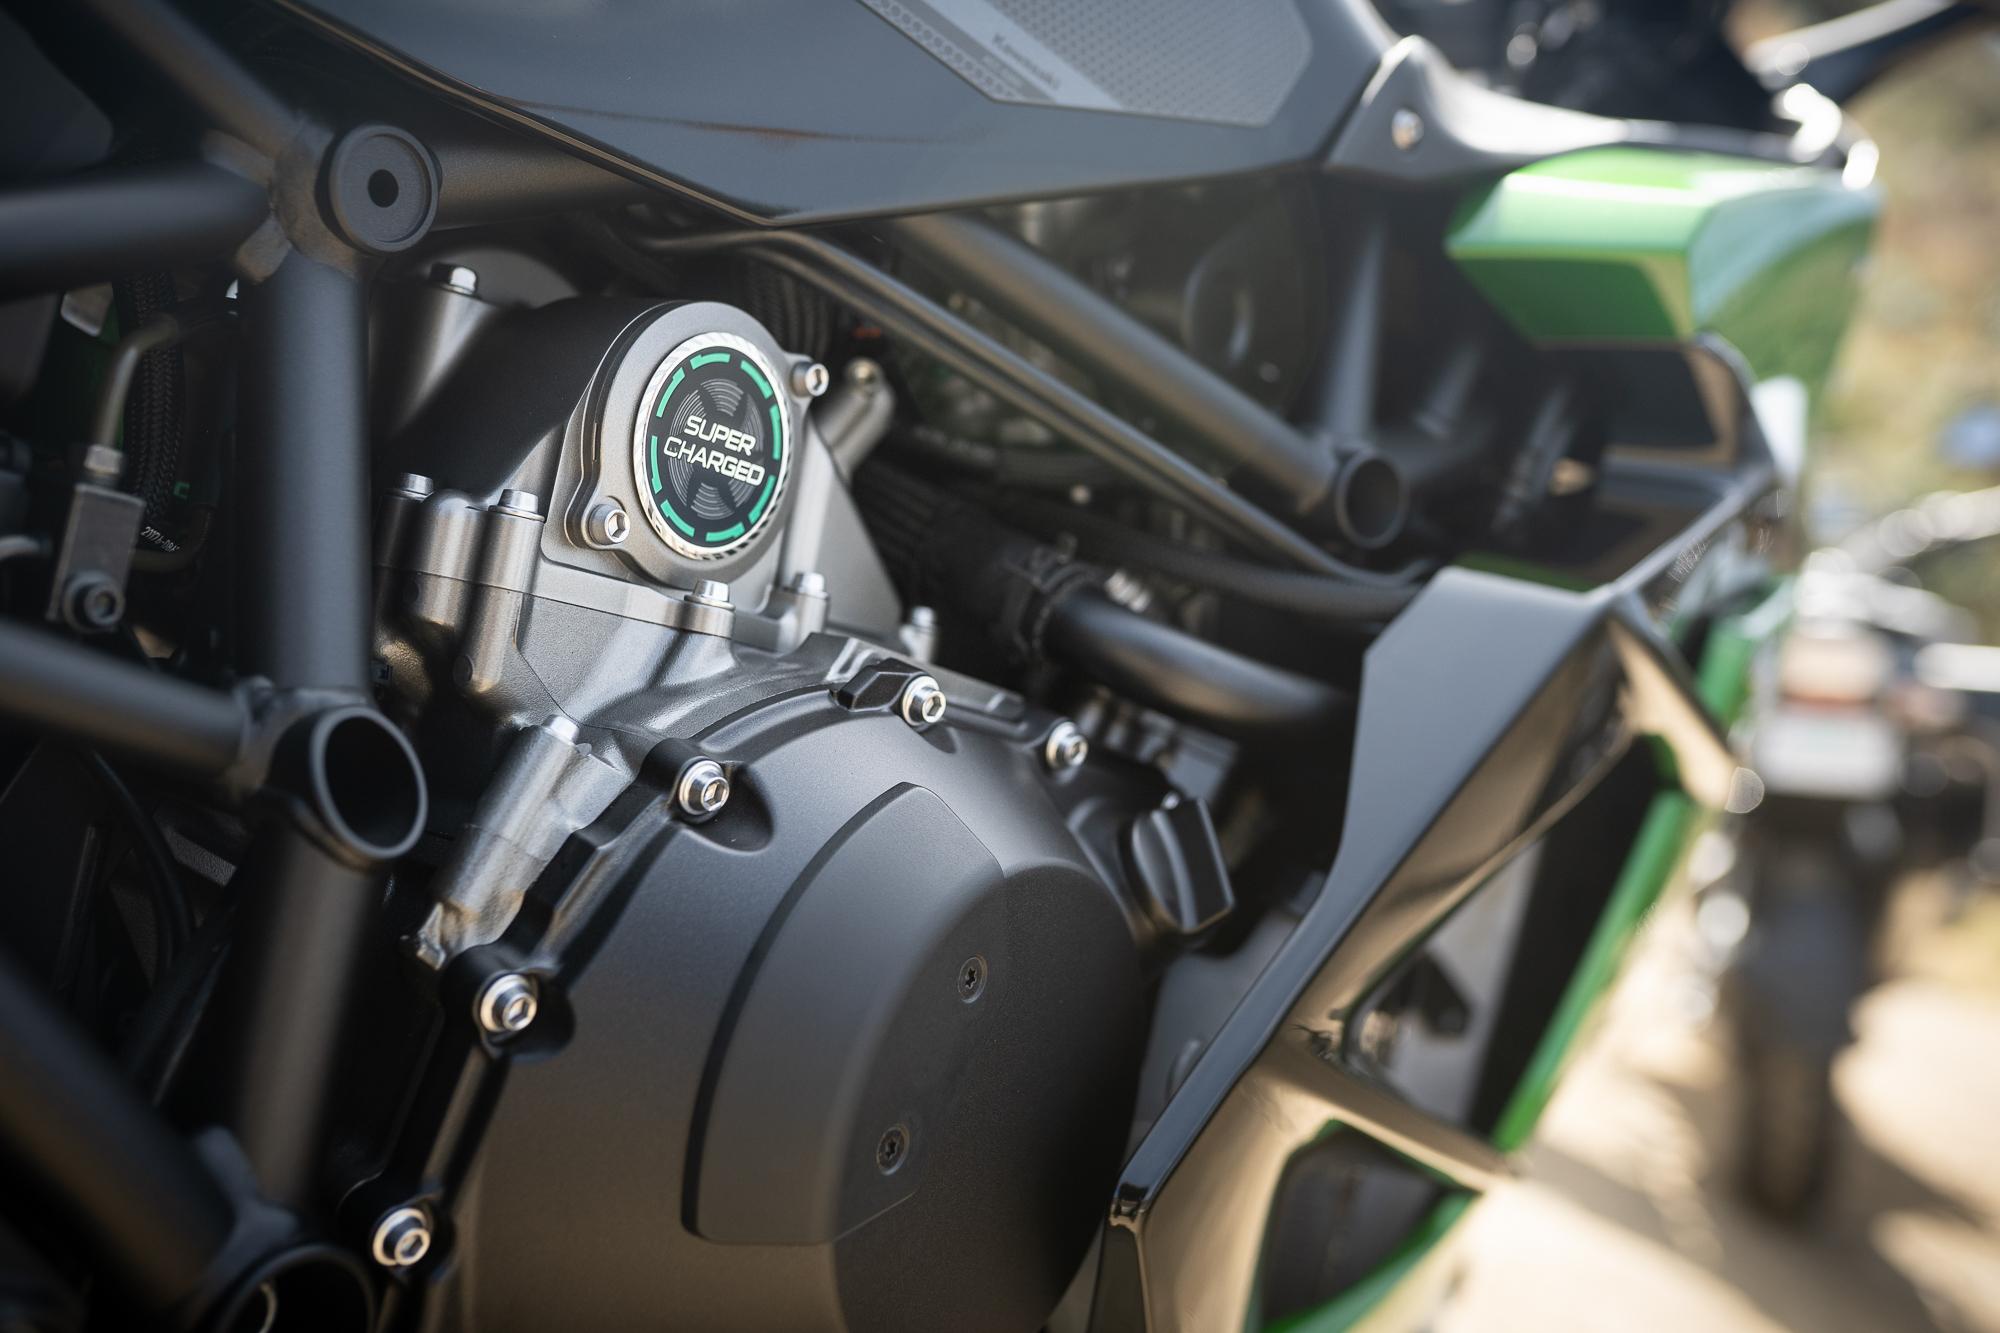 2021 Kawasaki H2 SX-SE super charged